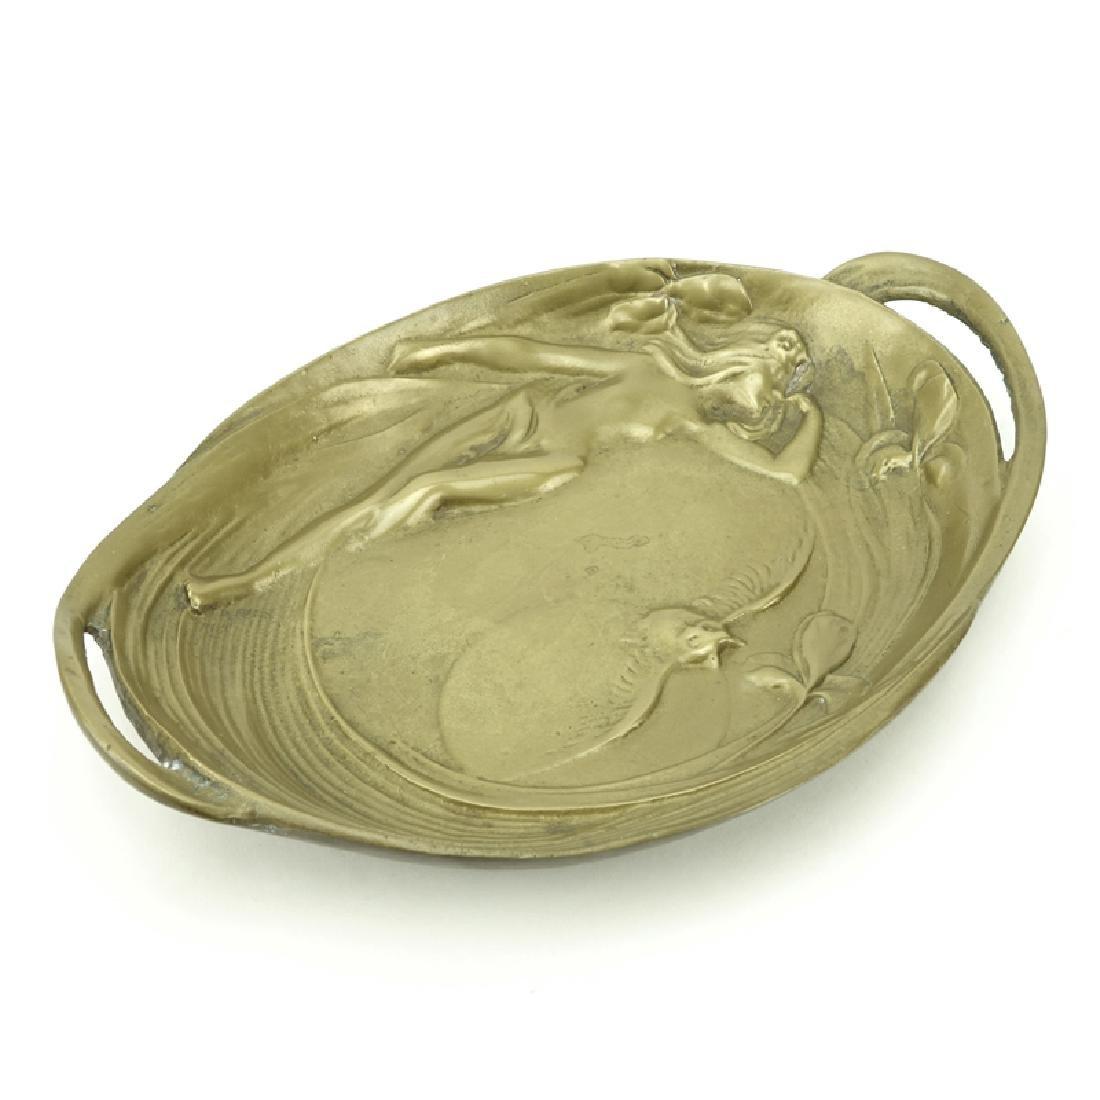 19/20th Century Gilt Bronze Art Nouveau Tray. Raised